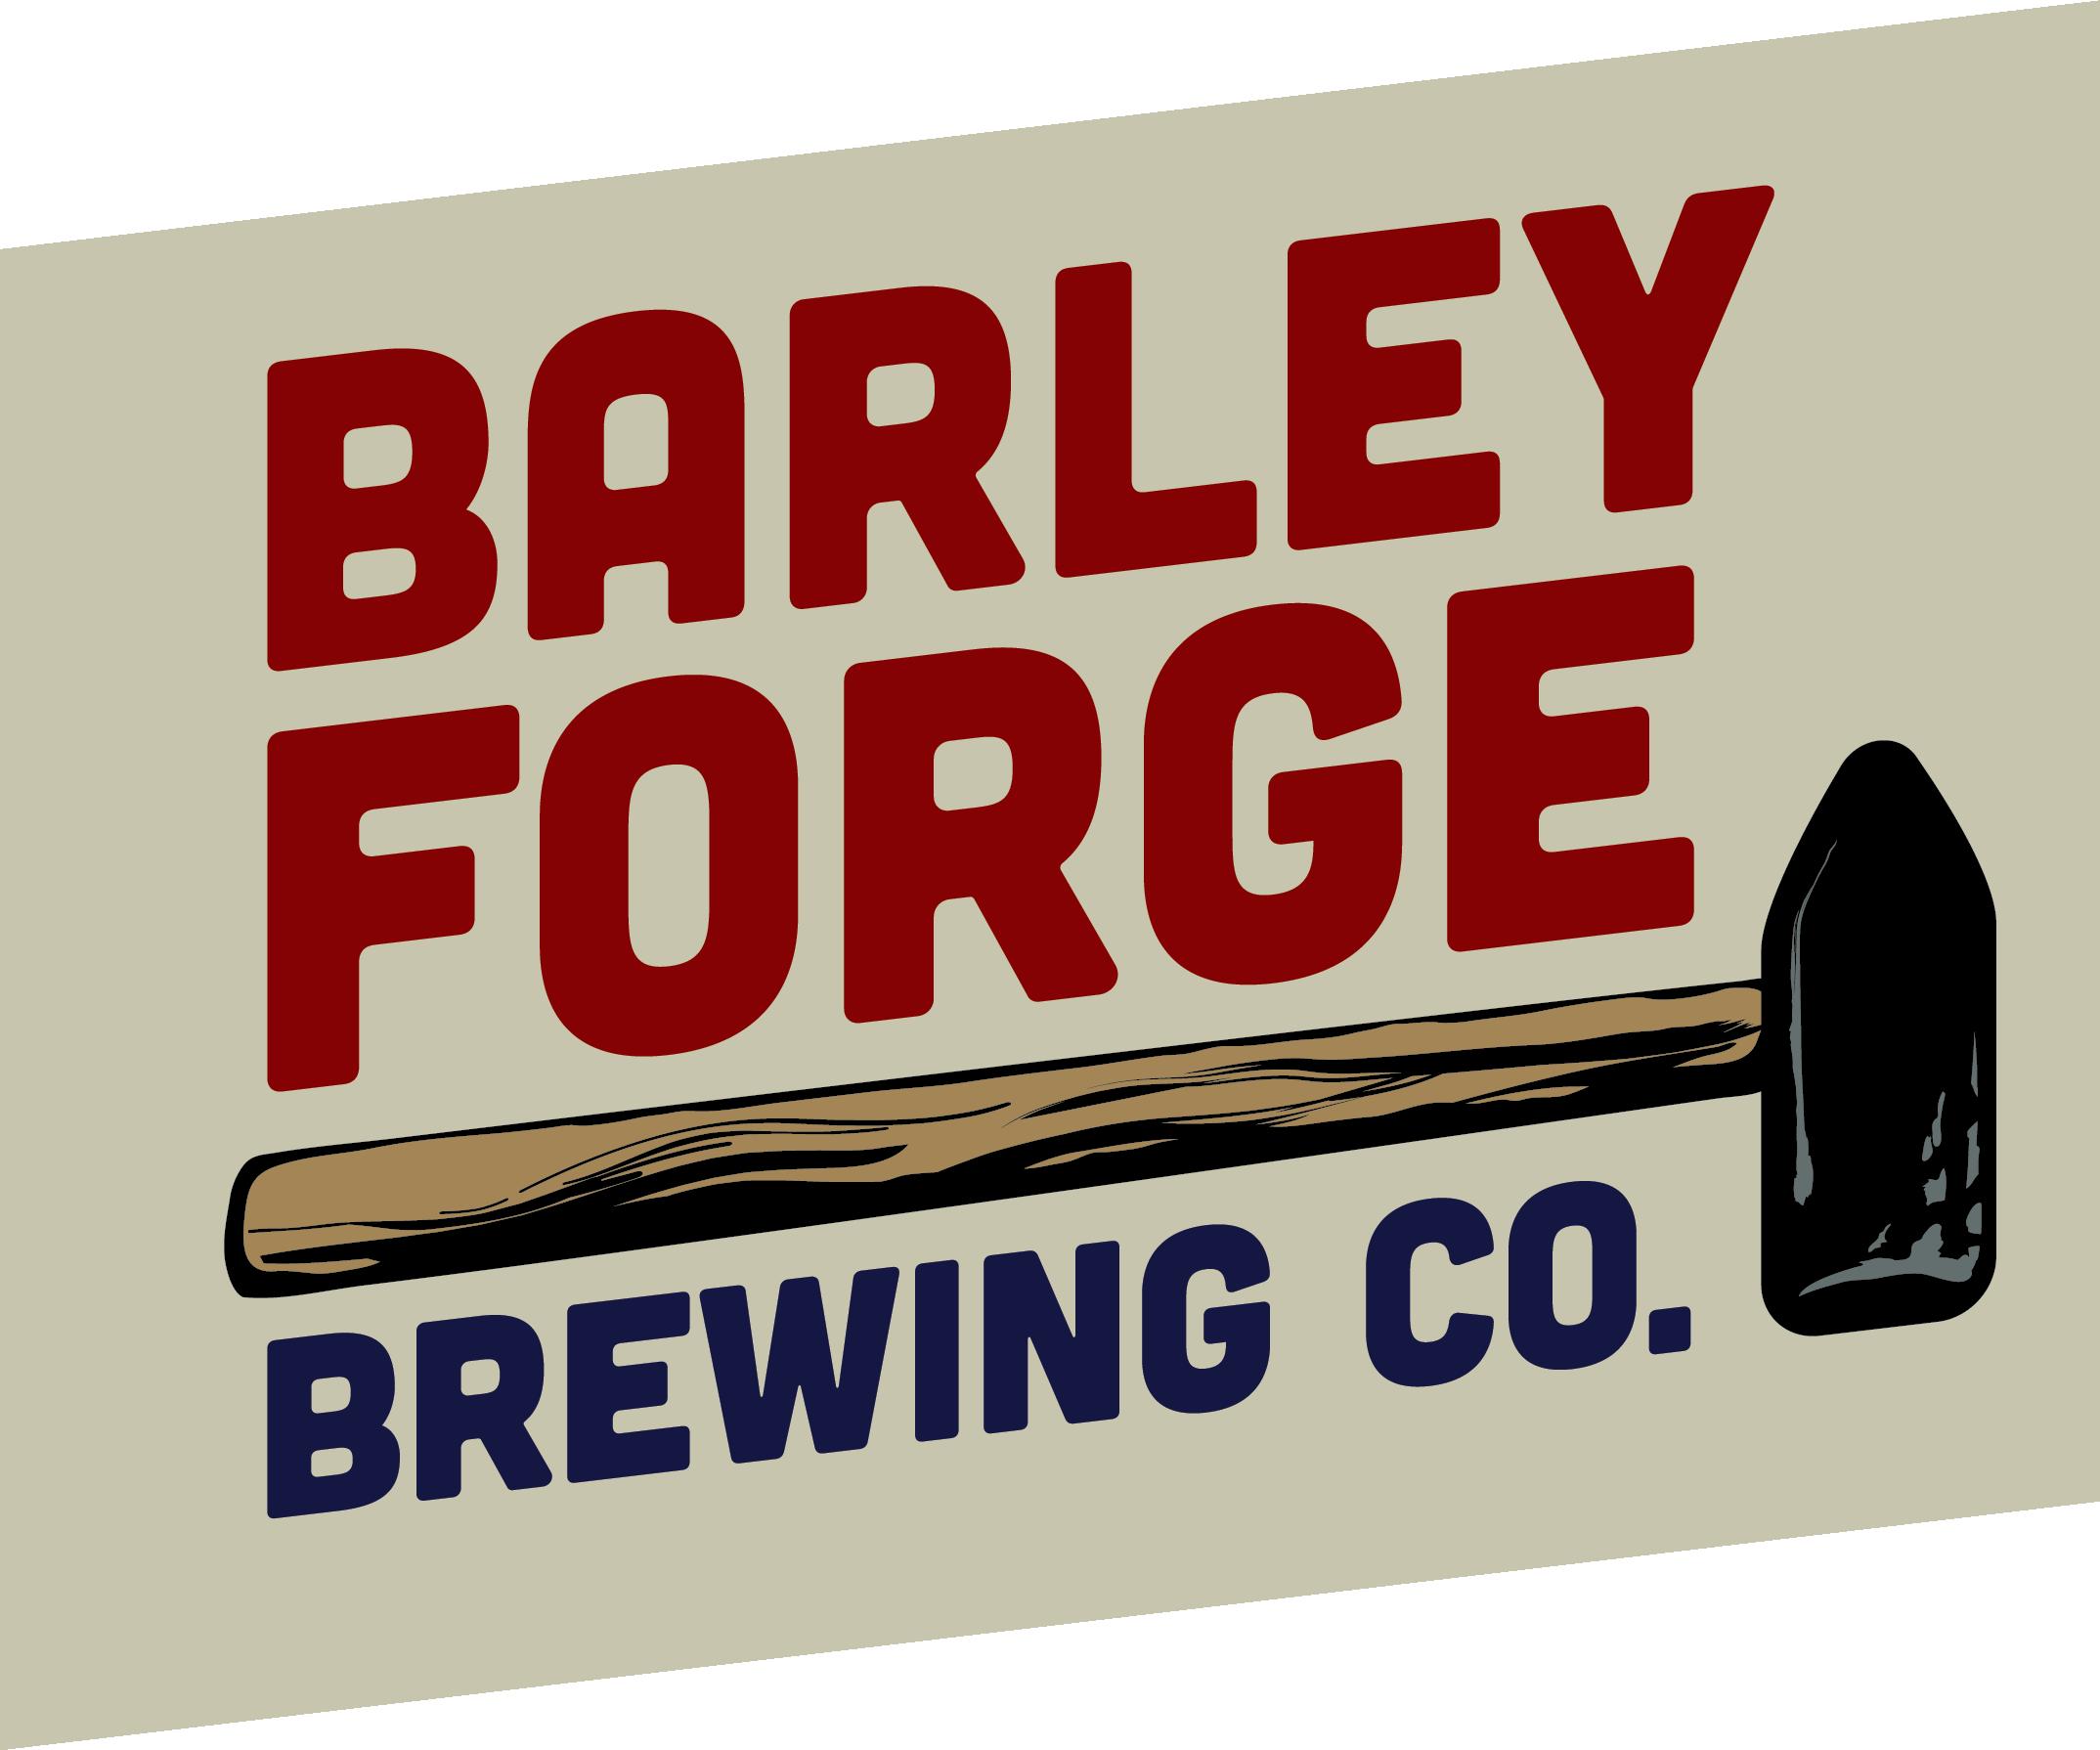 barley-forge-angled-logo-color.png